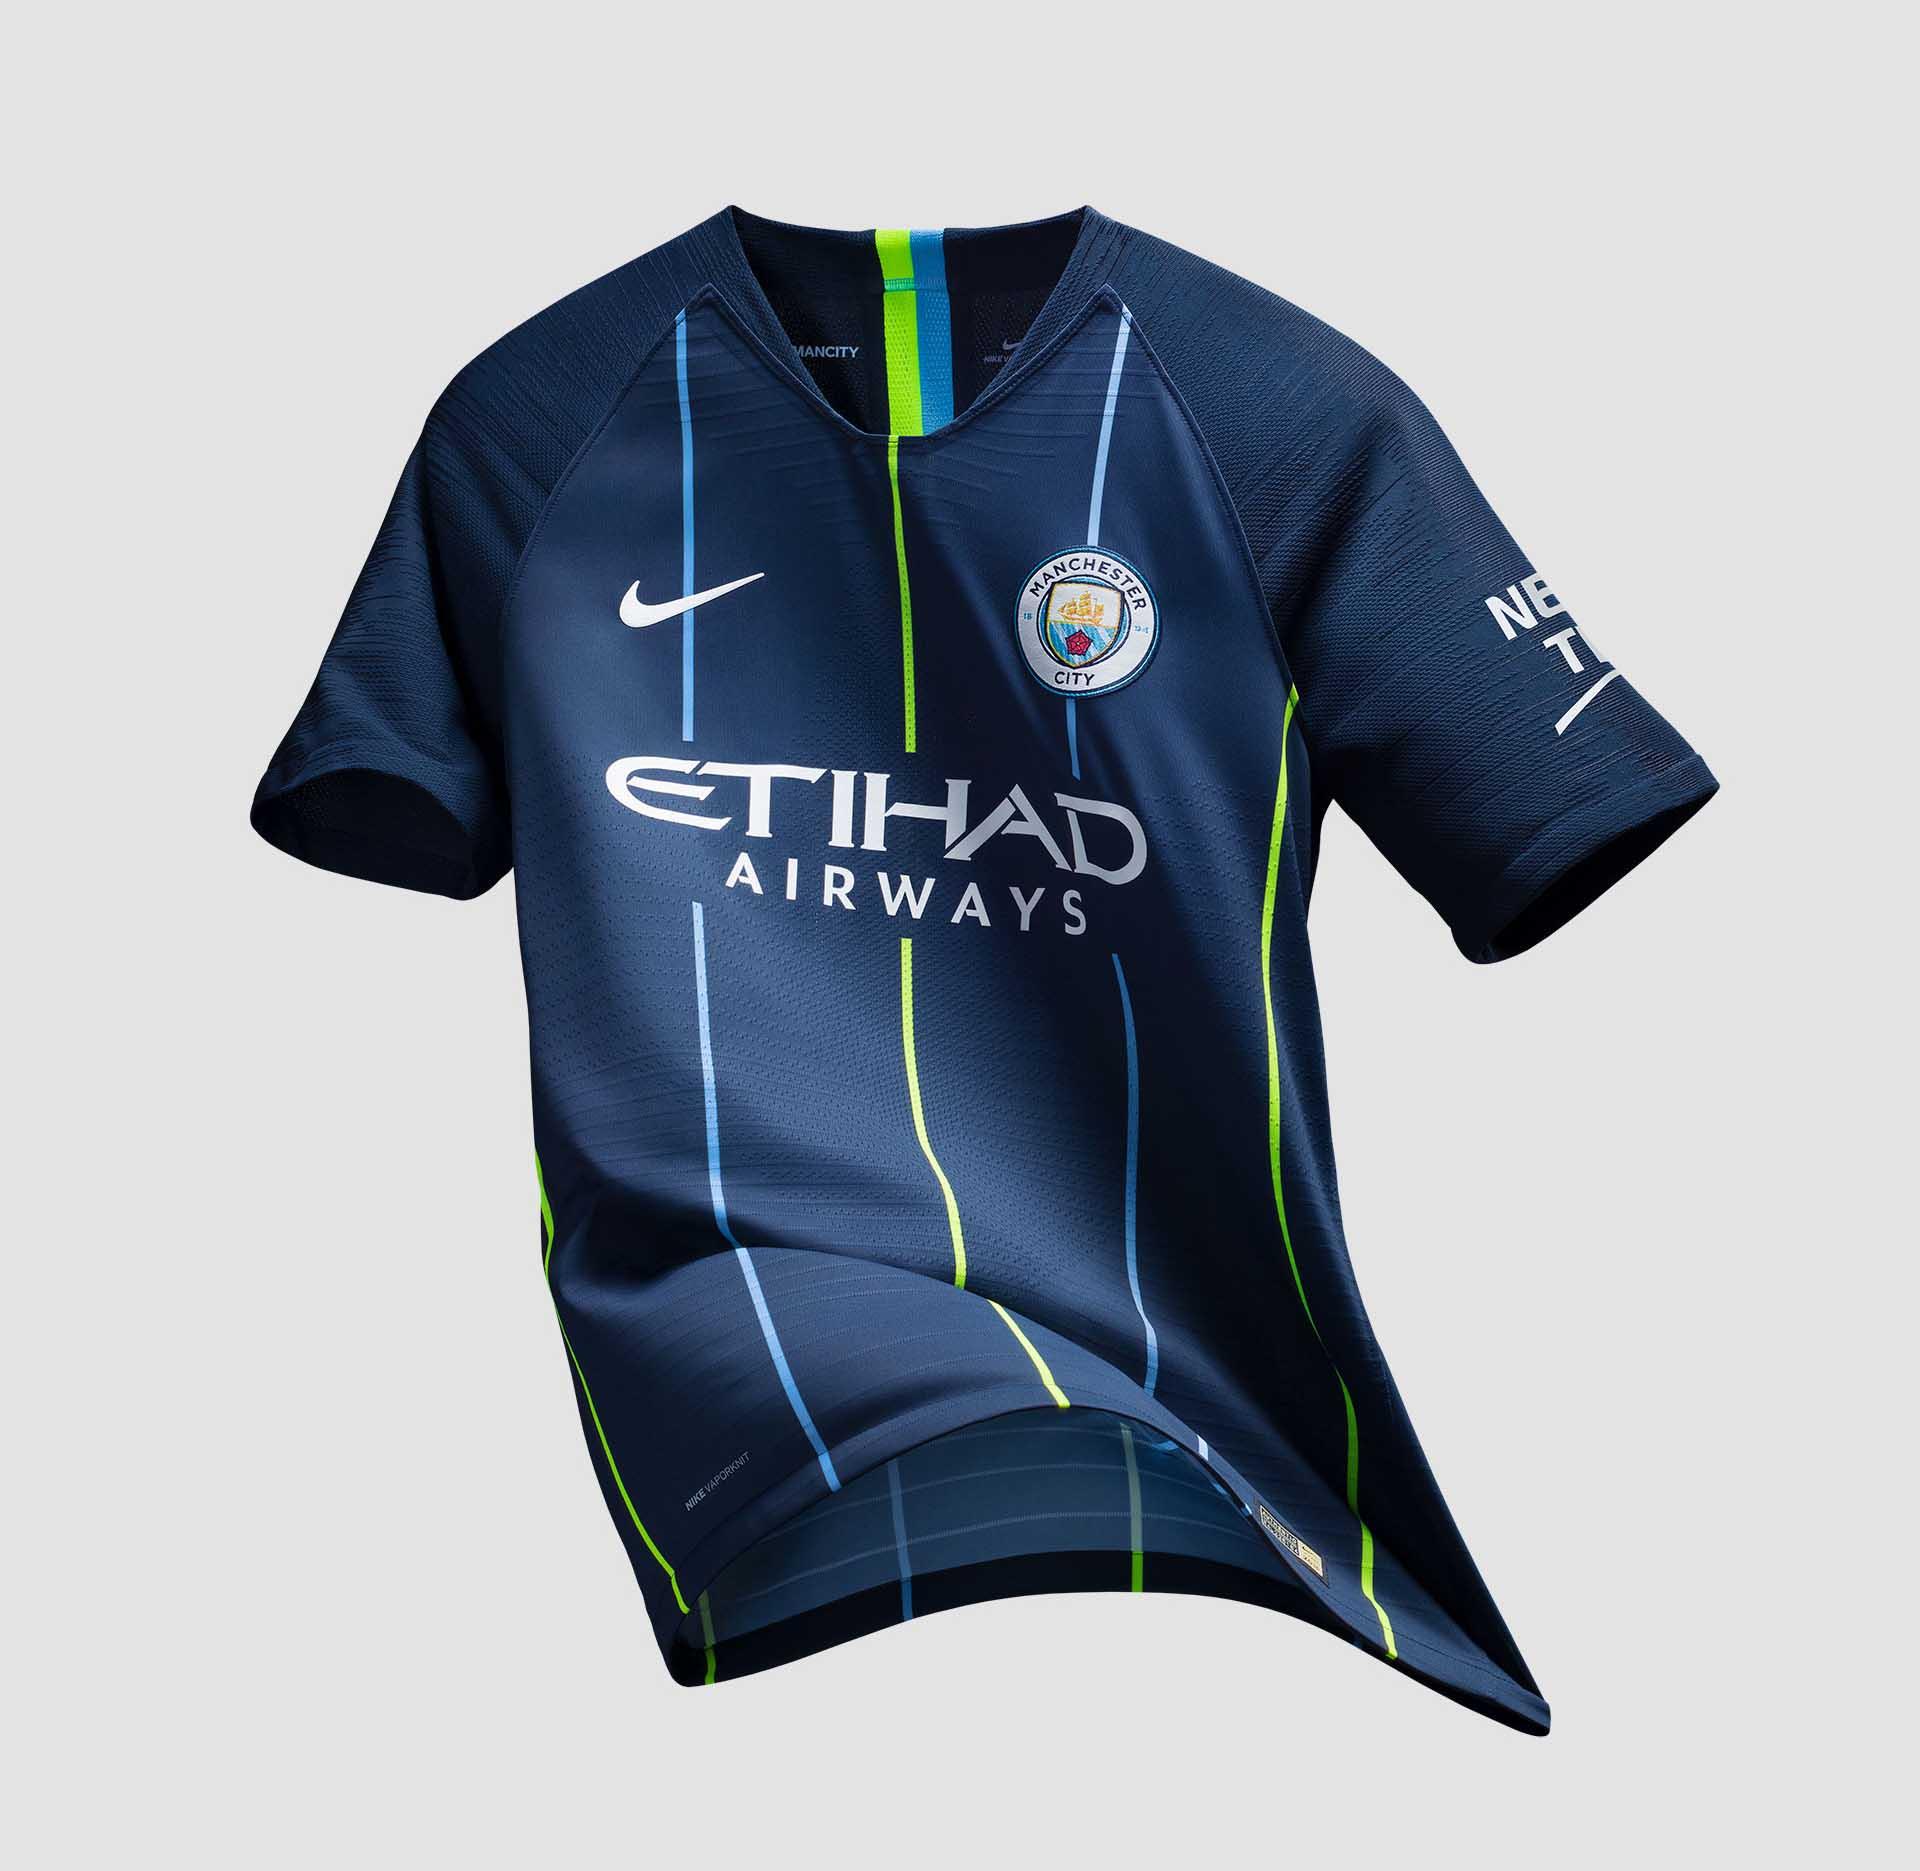 3998d0bc00b Nike Launch Man City 18 19 Away Kit - SoccerBible